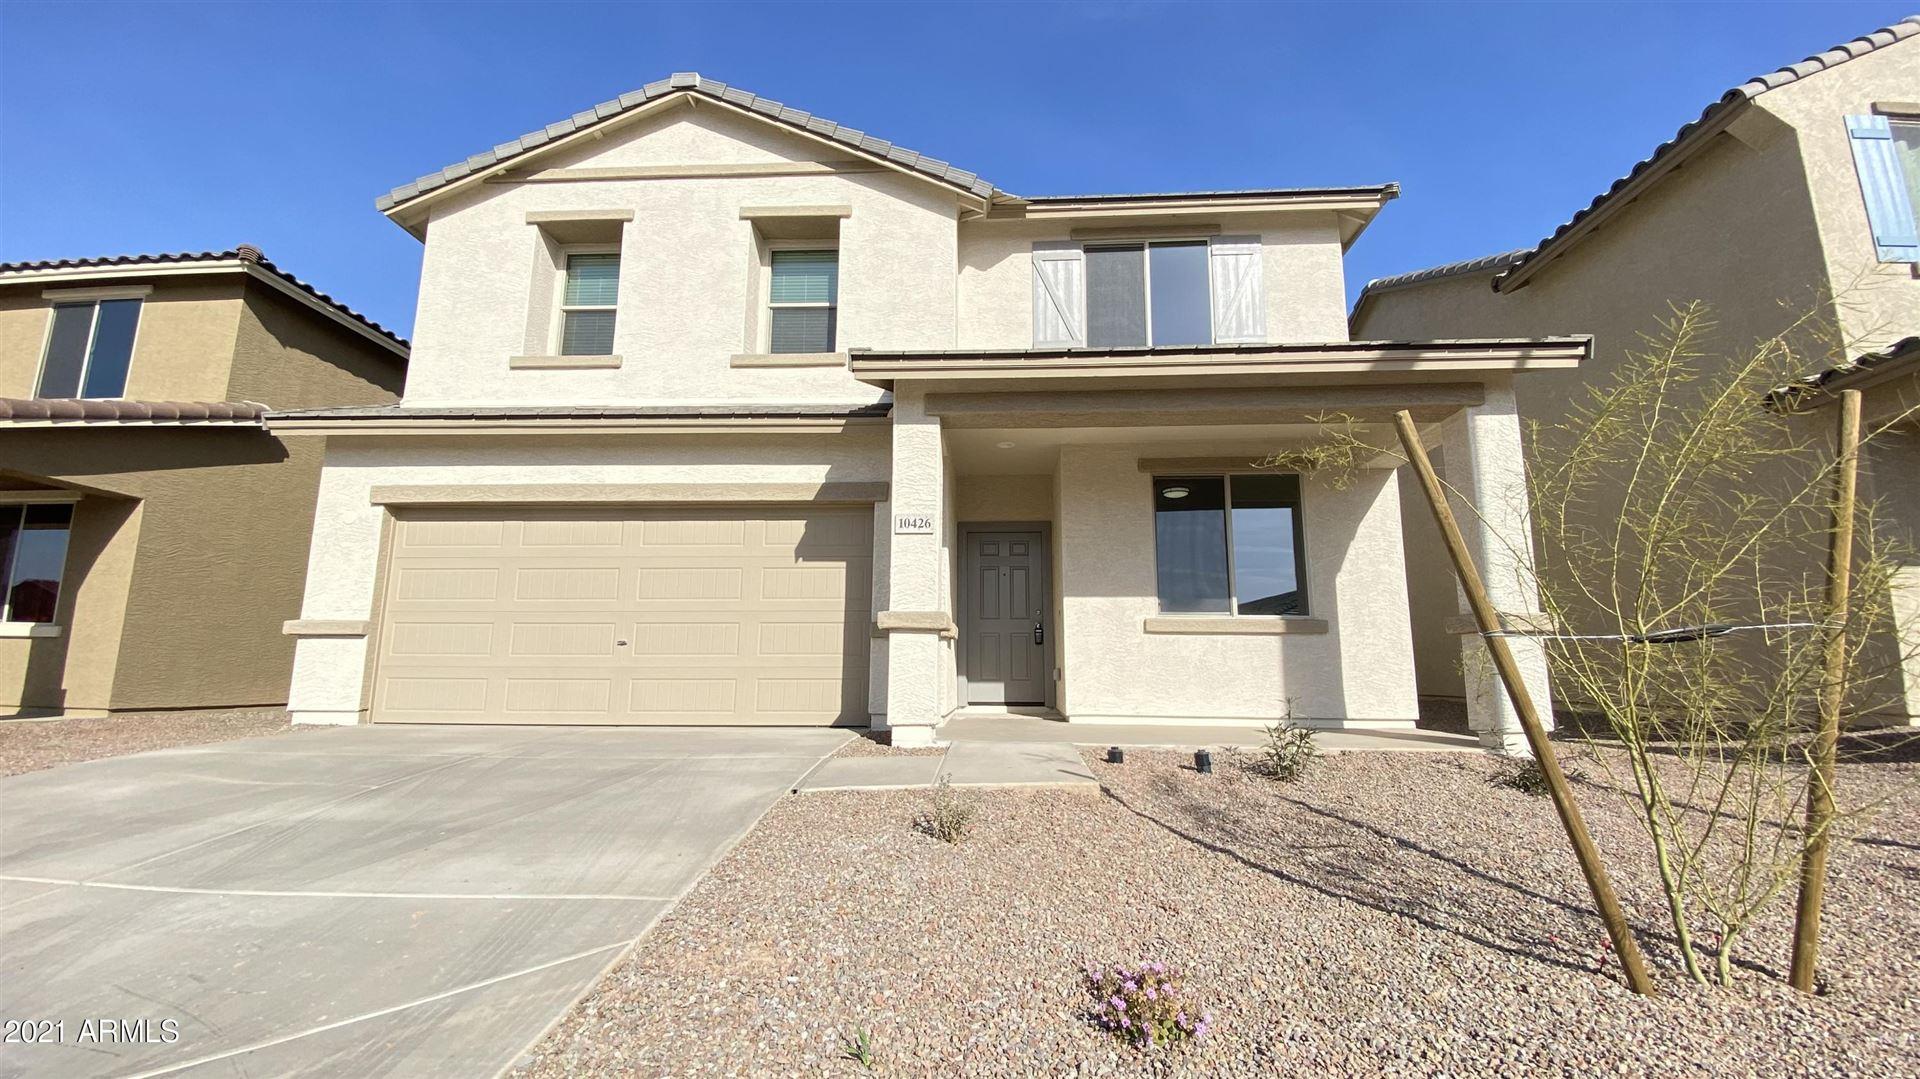 Photo of 10426 W CORDES Road, Tolleson, AZ 85353 (MLS # 6196631)